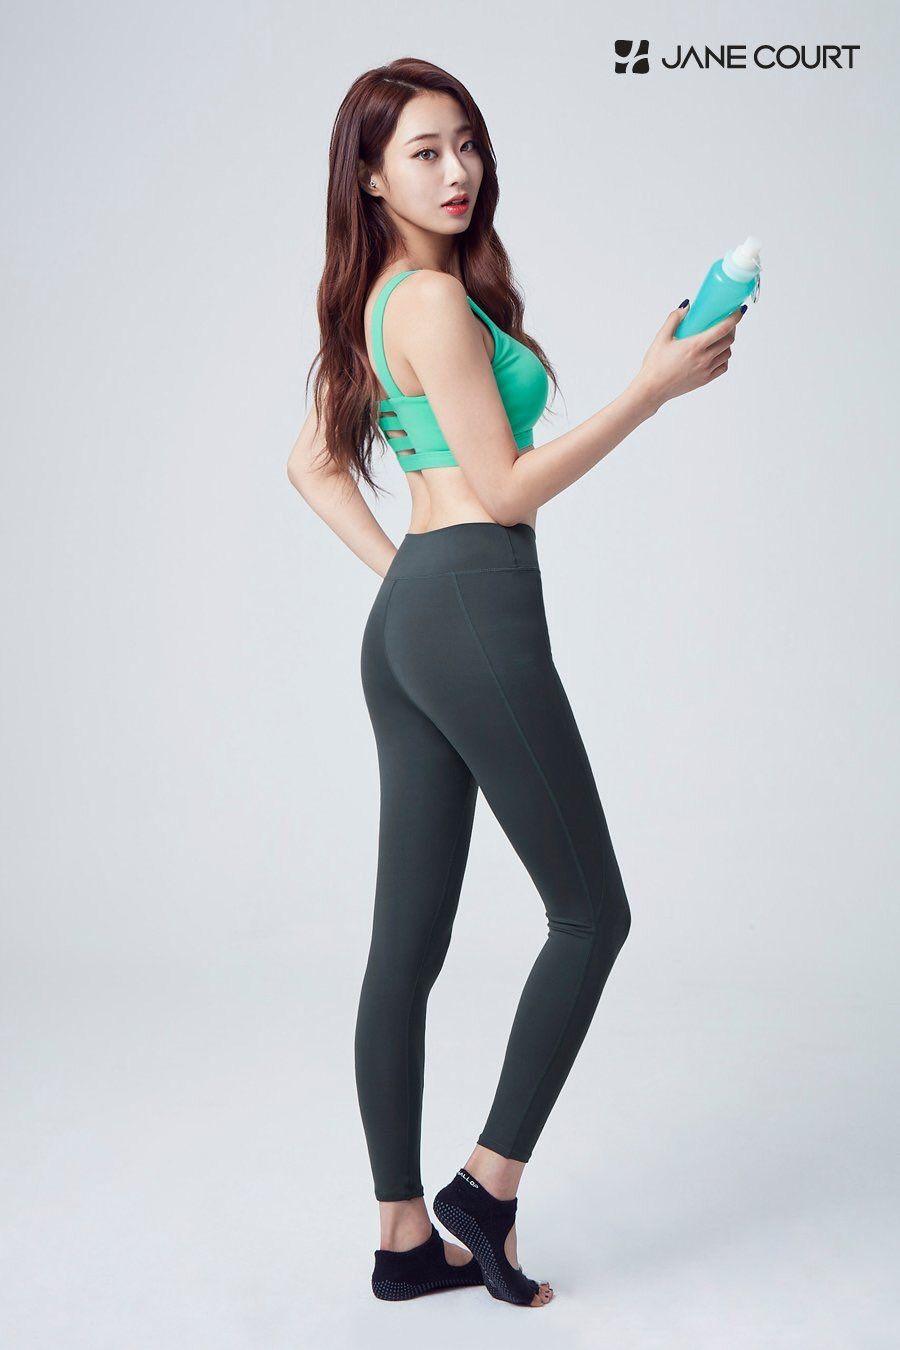 Kyungri Does Super Hot Yoga Pants Photoshoot For Jane